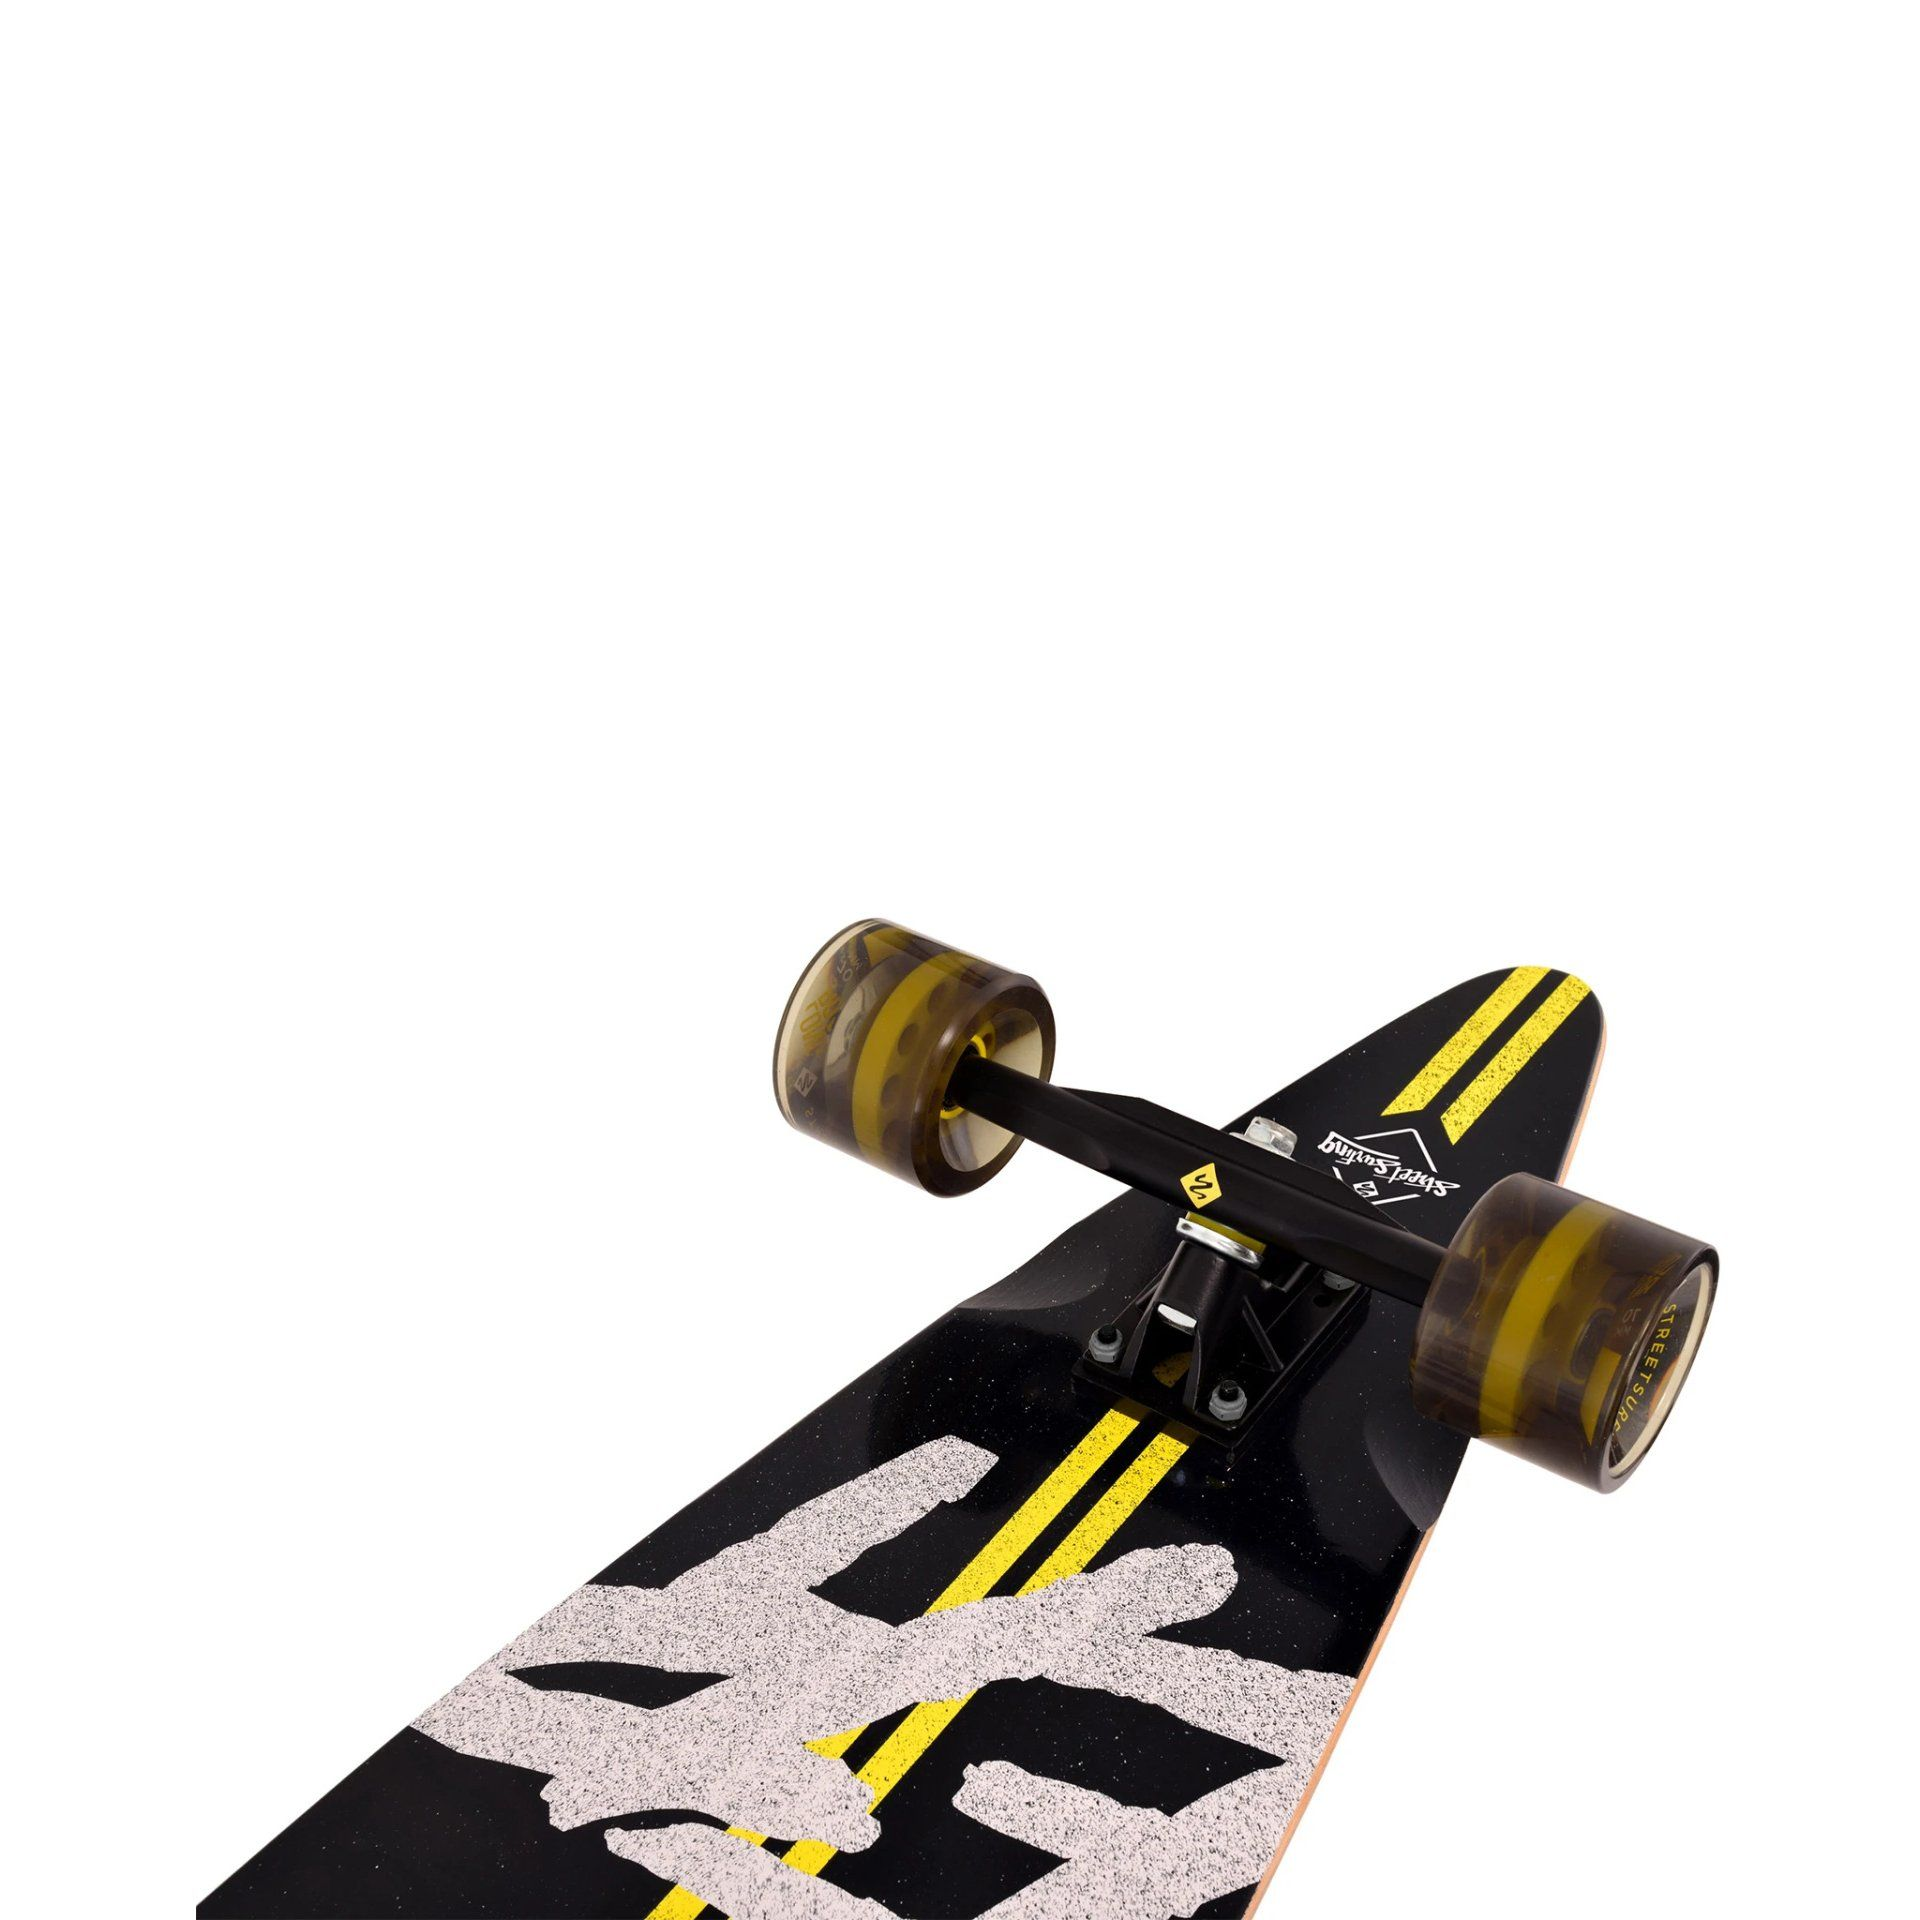 "LONGBOARD STREET SURFING PINTAIL 40"" ROAD LINE KOŁA"